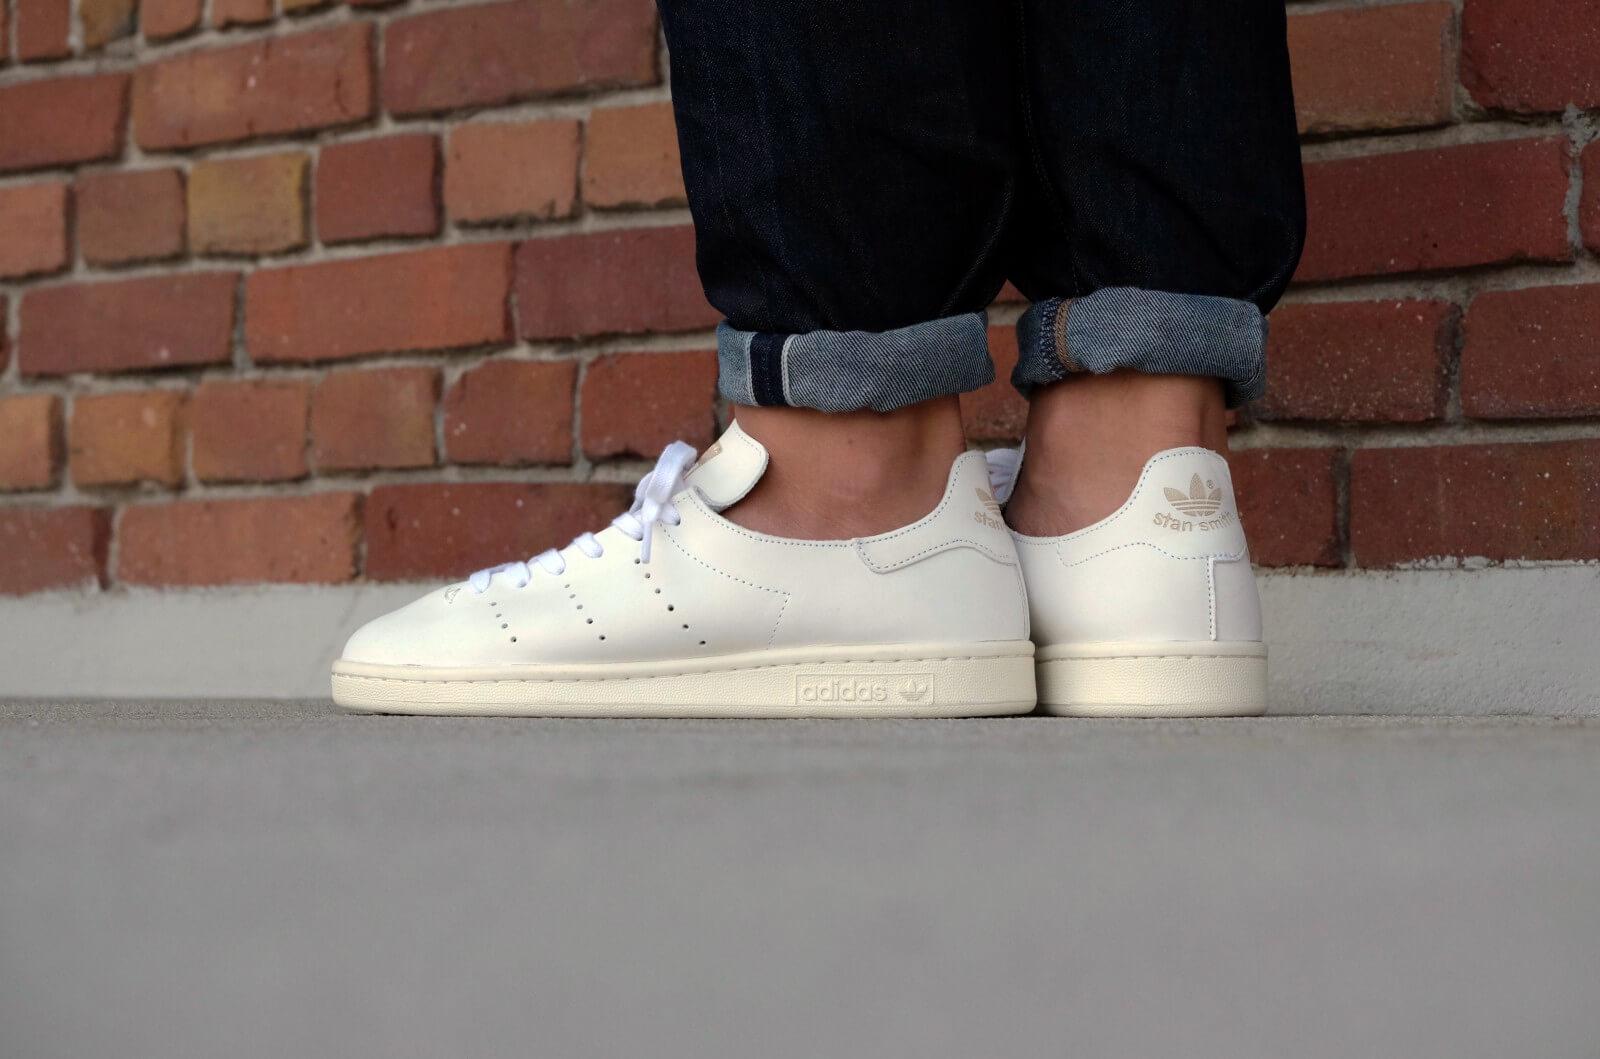 Adidas Stan Smith LEA Sock Footwear